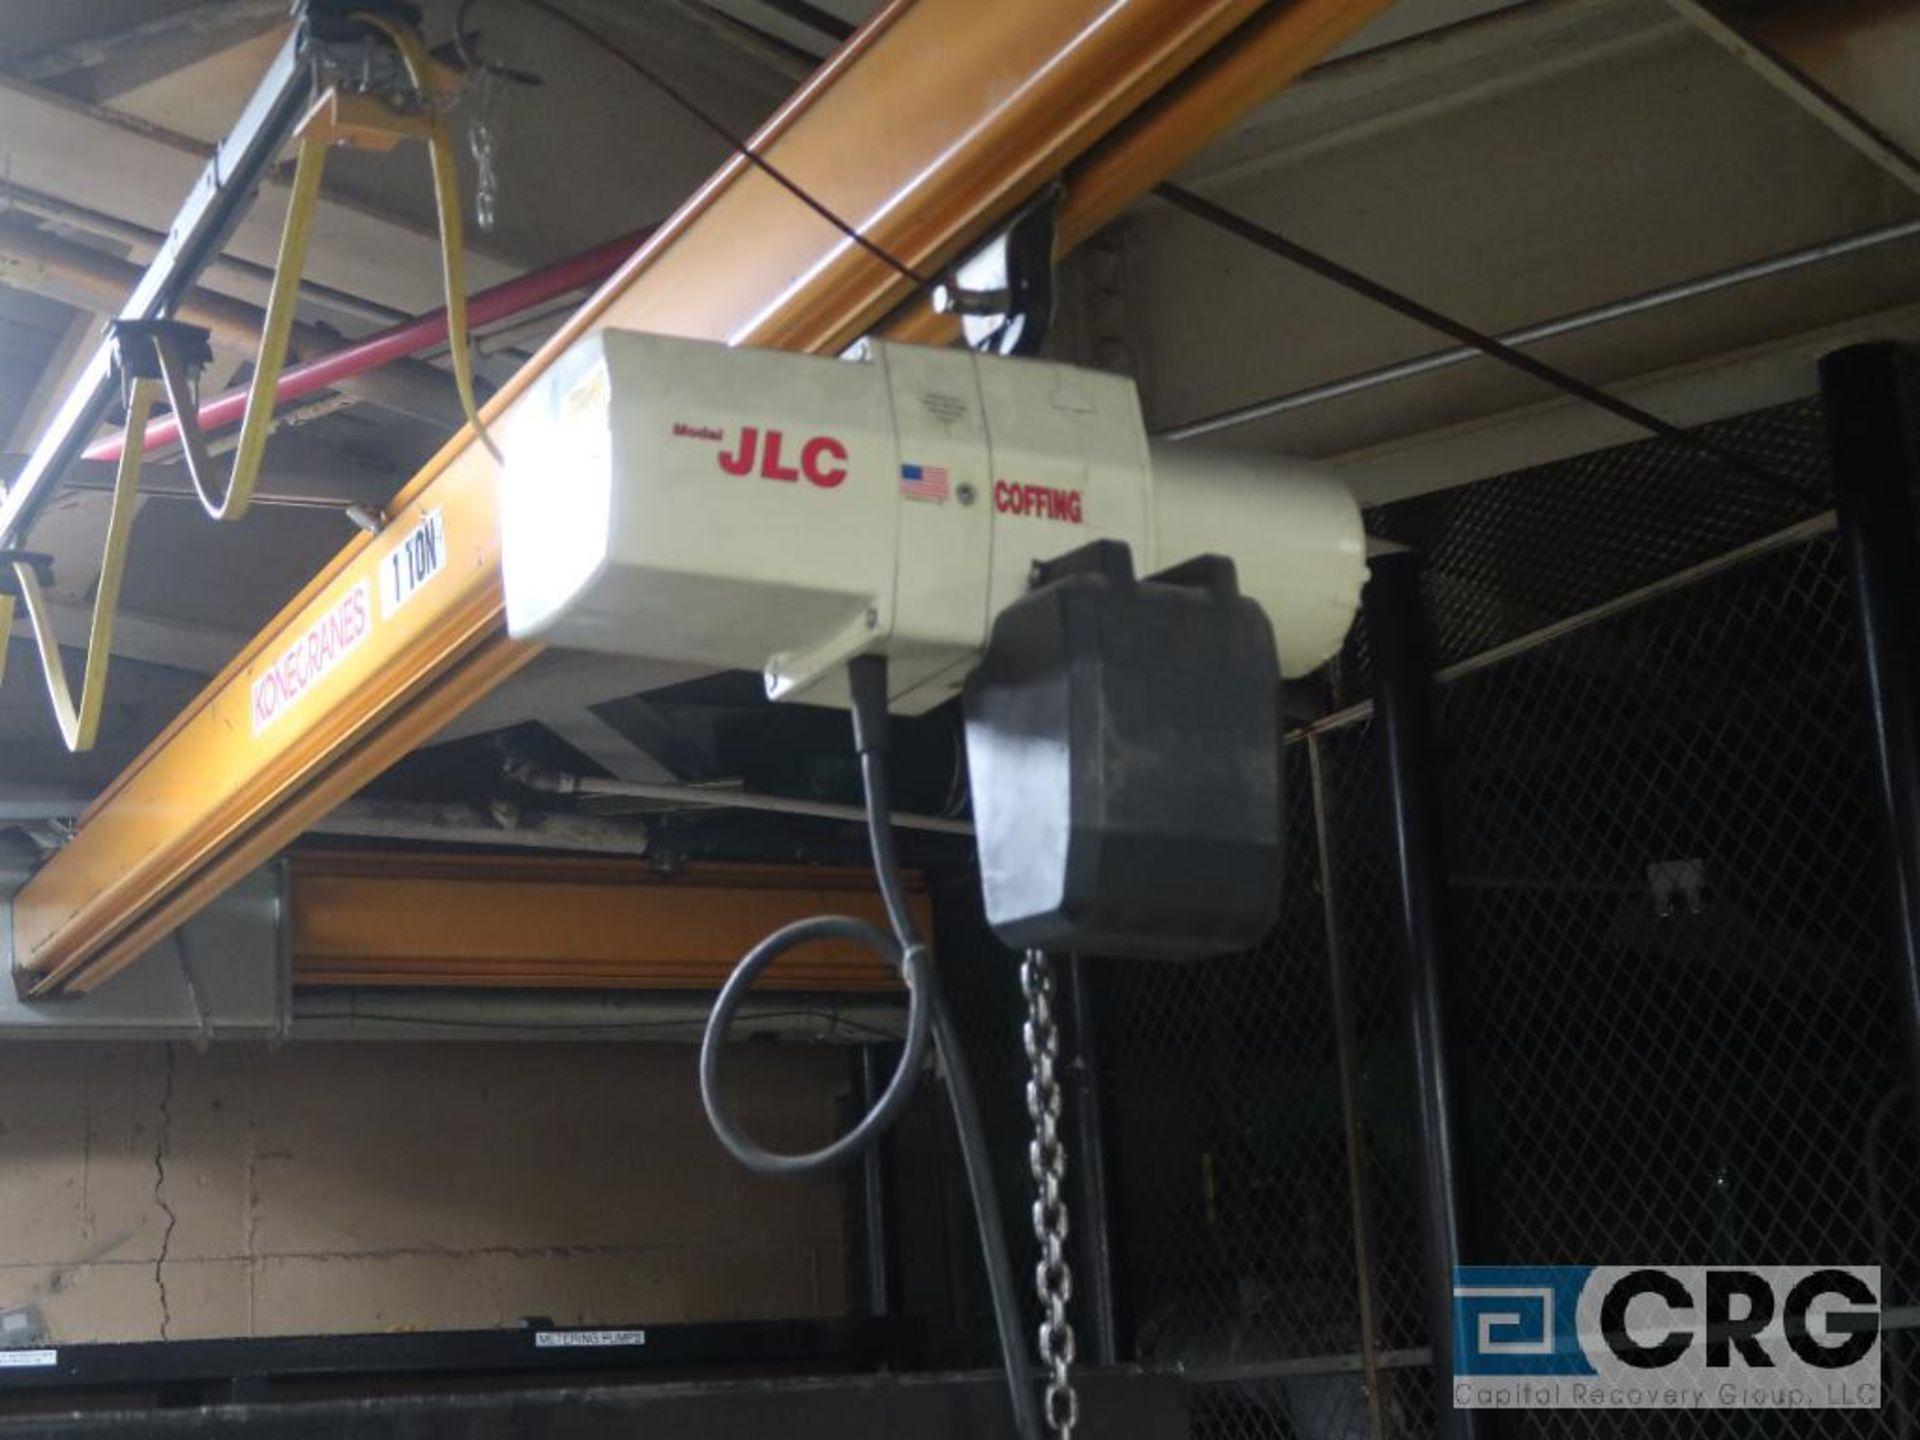 Konecrane bridge crane with coffin, JLC electric chain hoist, 16 ft. W x 22 ft. L, 1 ton cap. (